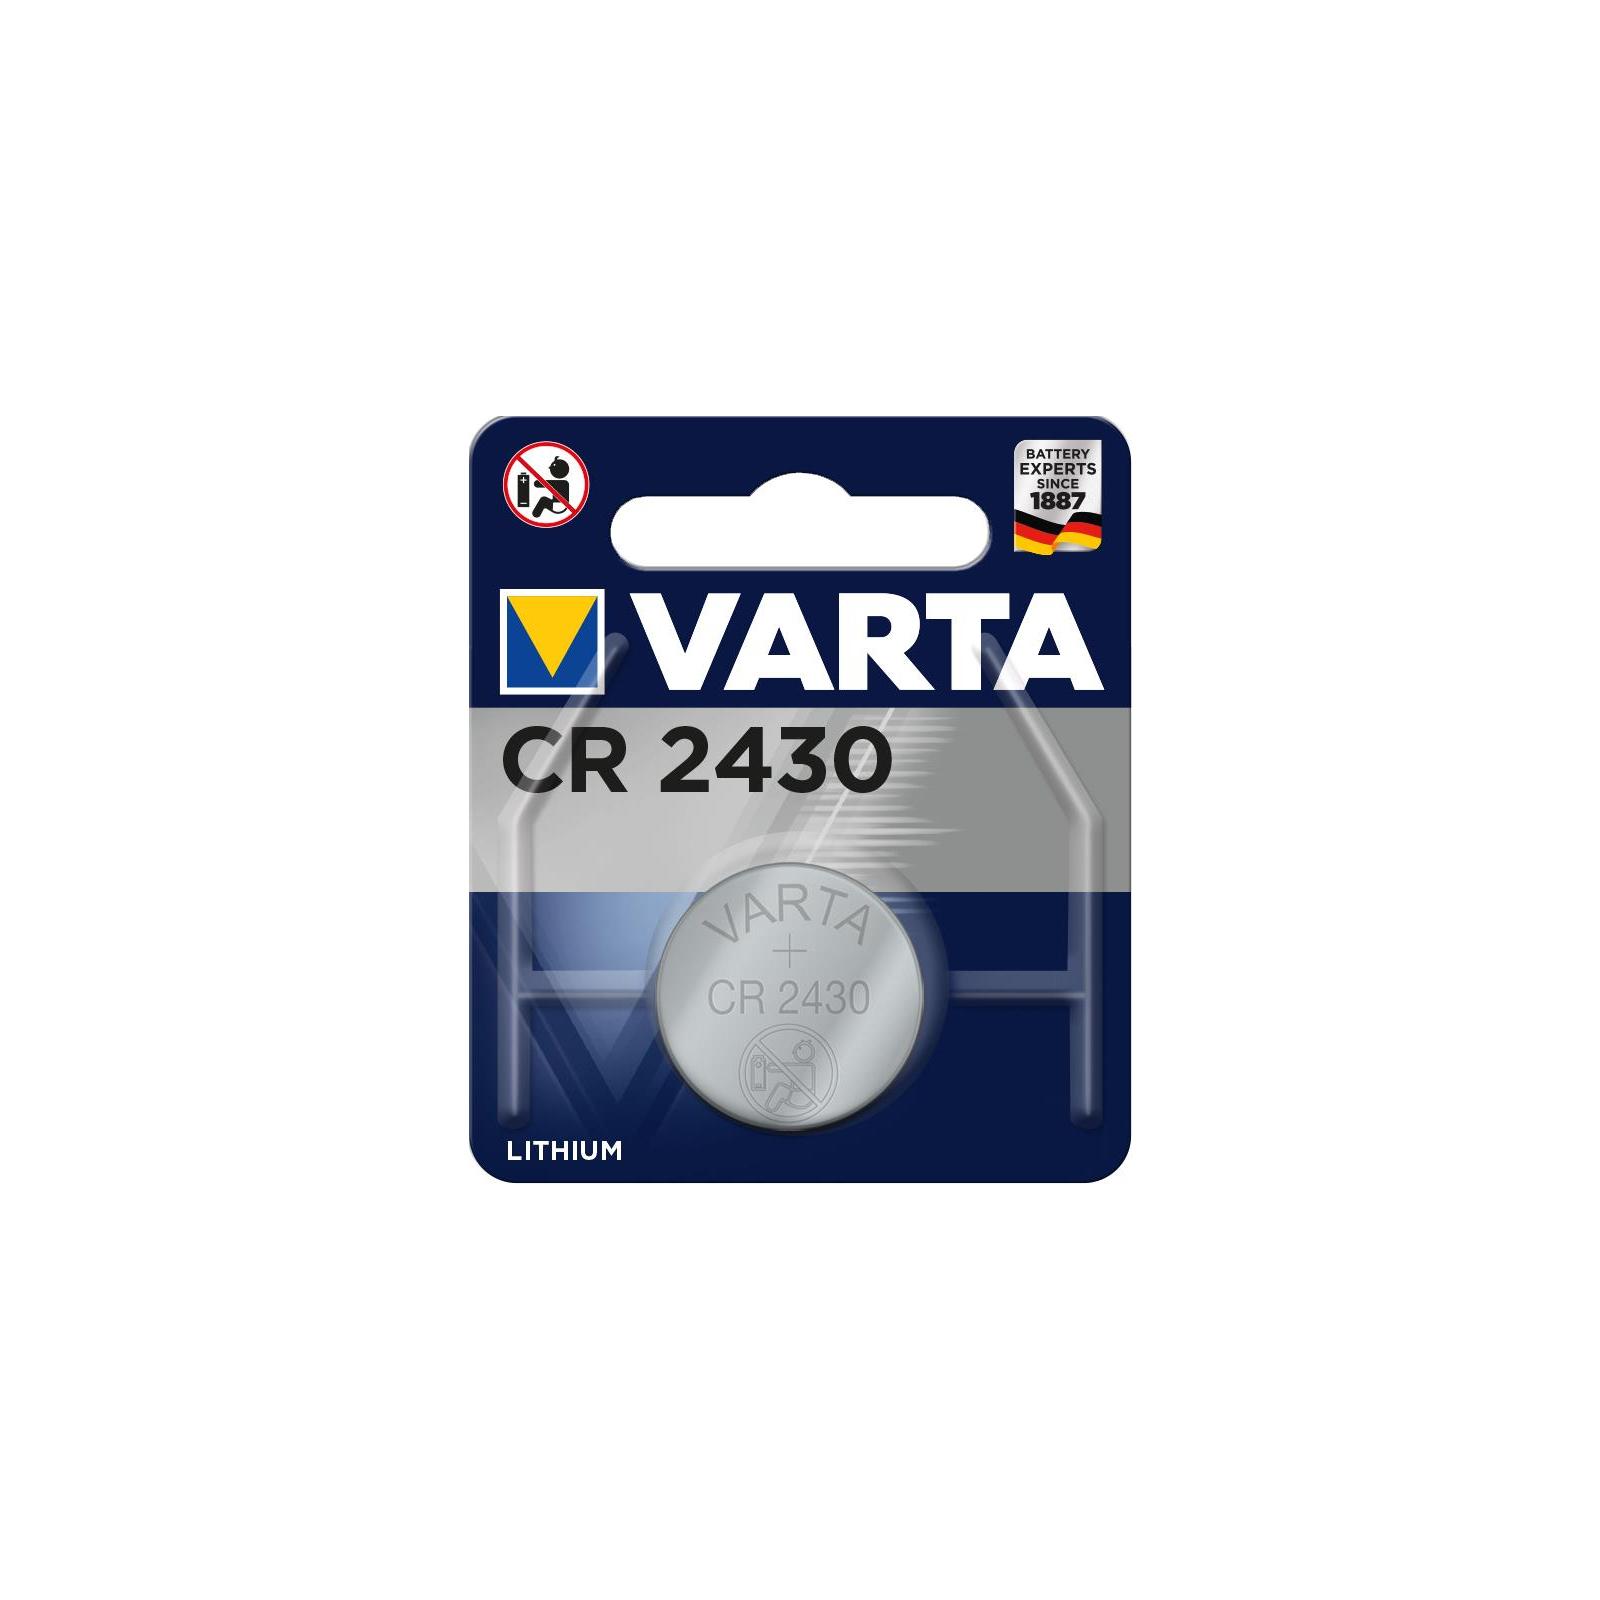 Батарейка Varta CR 2430 Lithium * 1 (06430101401)